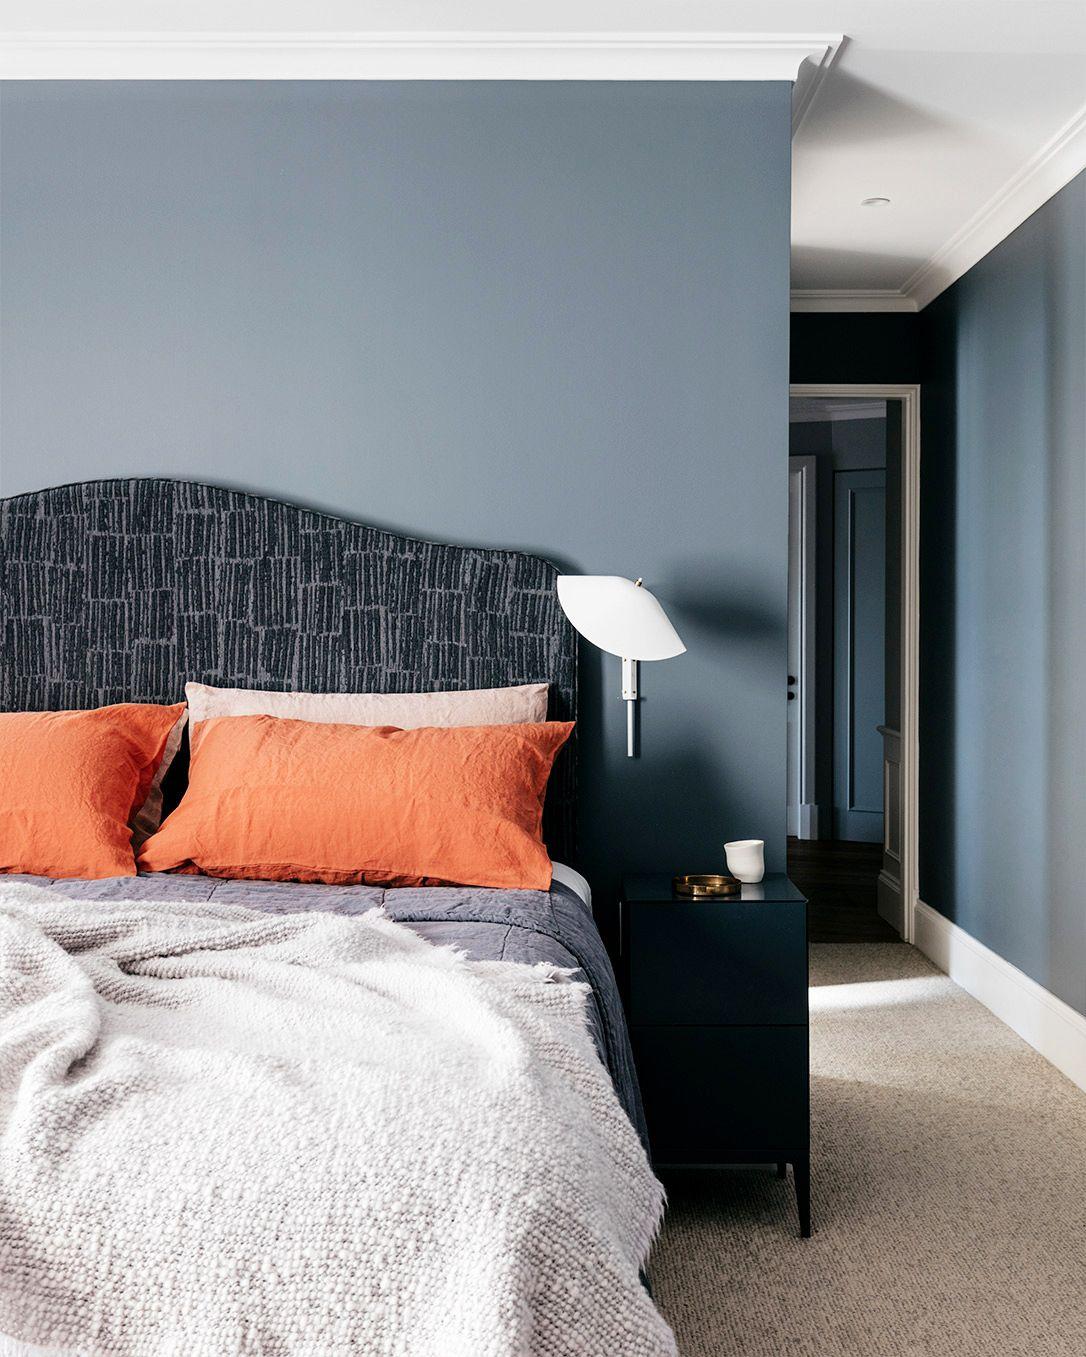 64 stylish bedroom design ideas